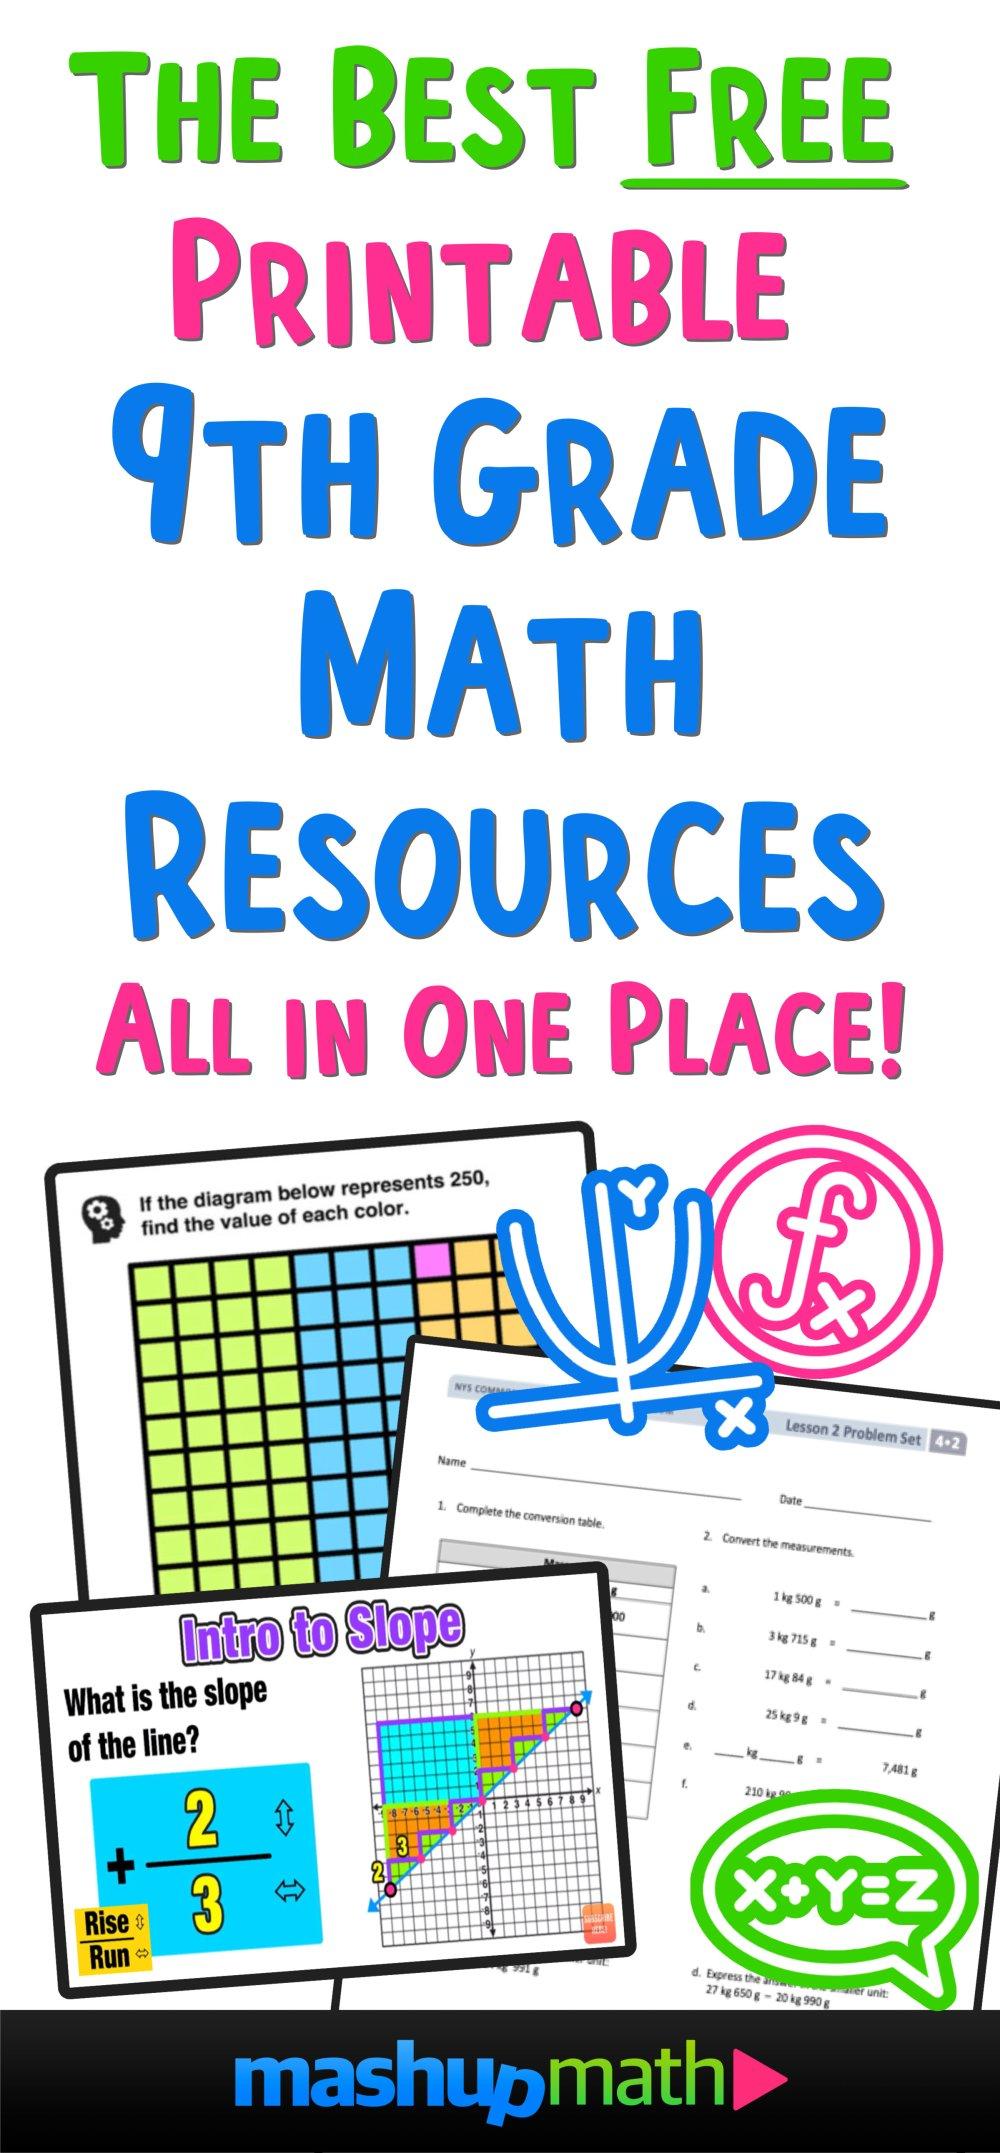 medium resolution of The Best Free 9th Grade Math Resources: Complete List! — Mashup Math